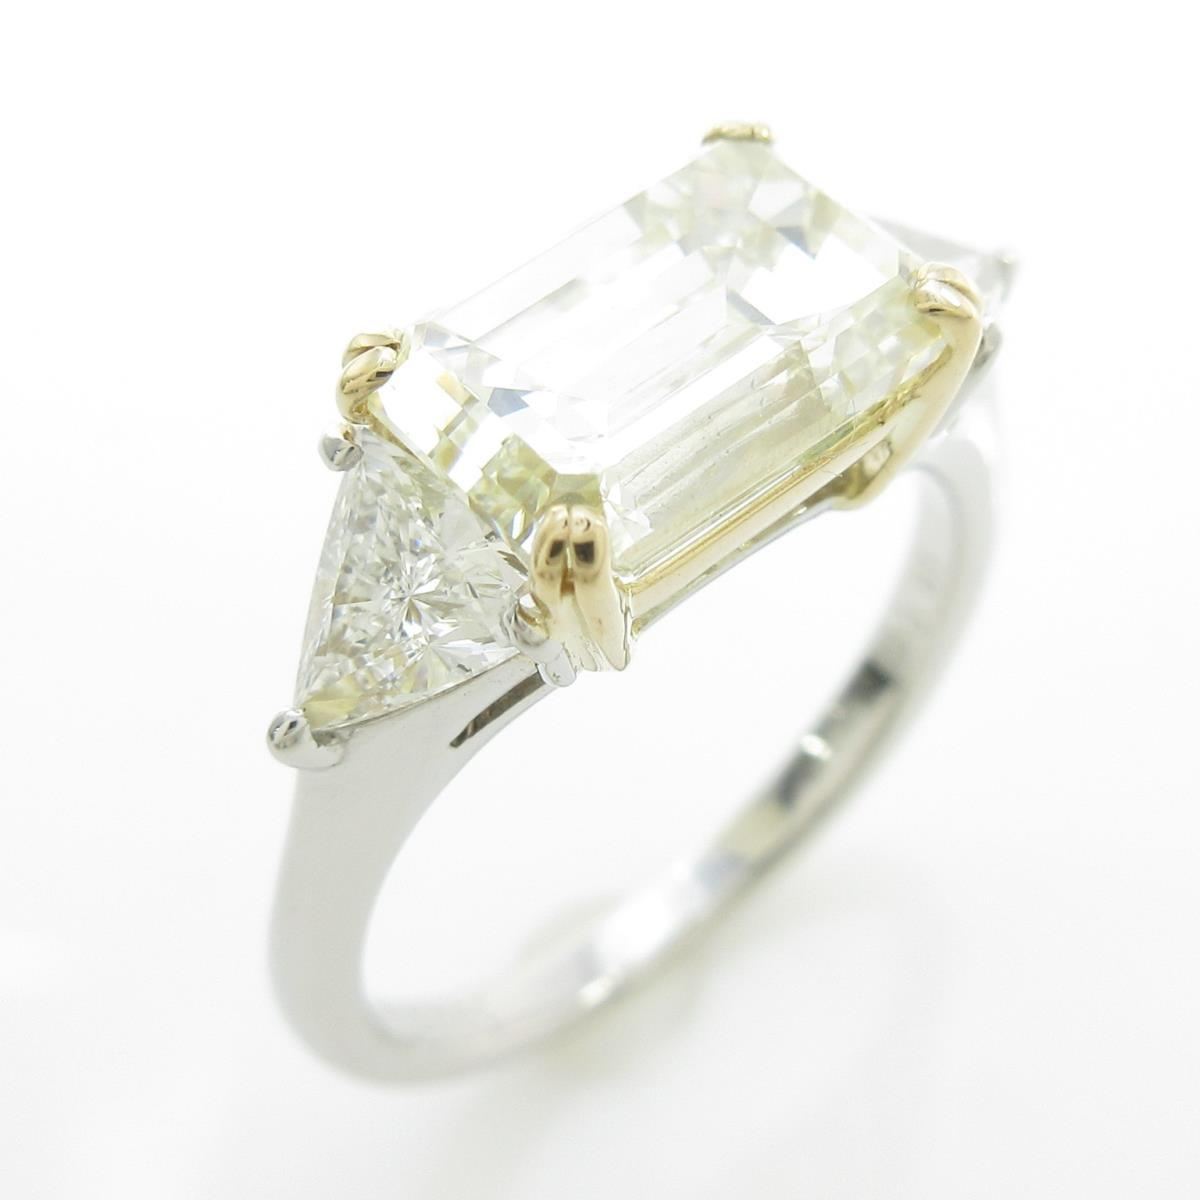 K18YG/プラチナダイヤモンドリング 3.050ct・VLY・VS1・エメラルドカット【中古】